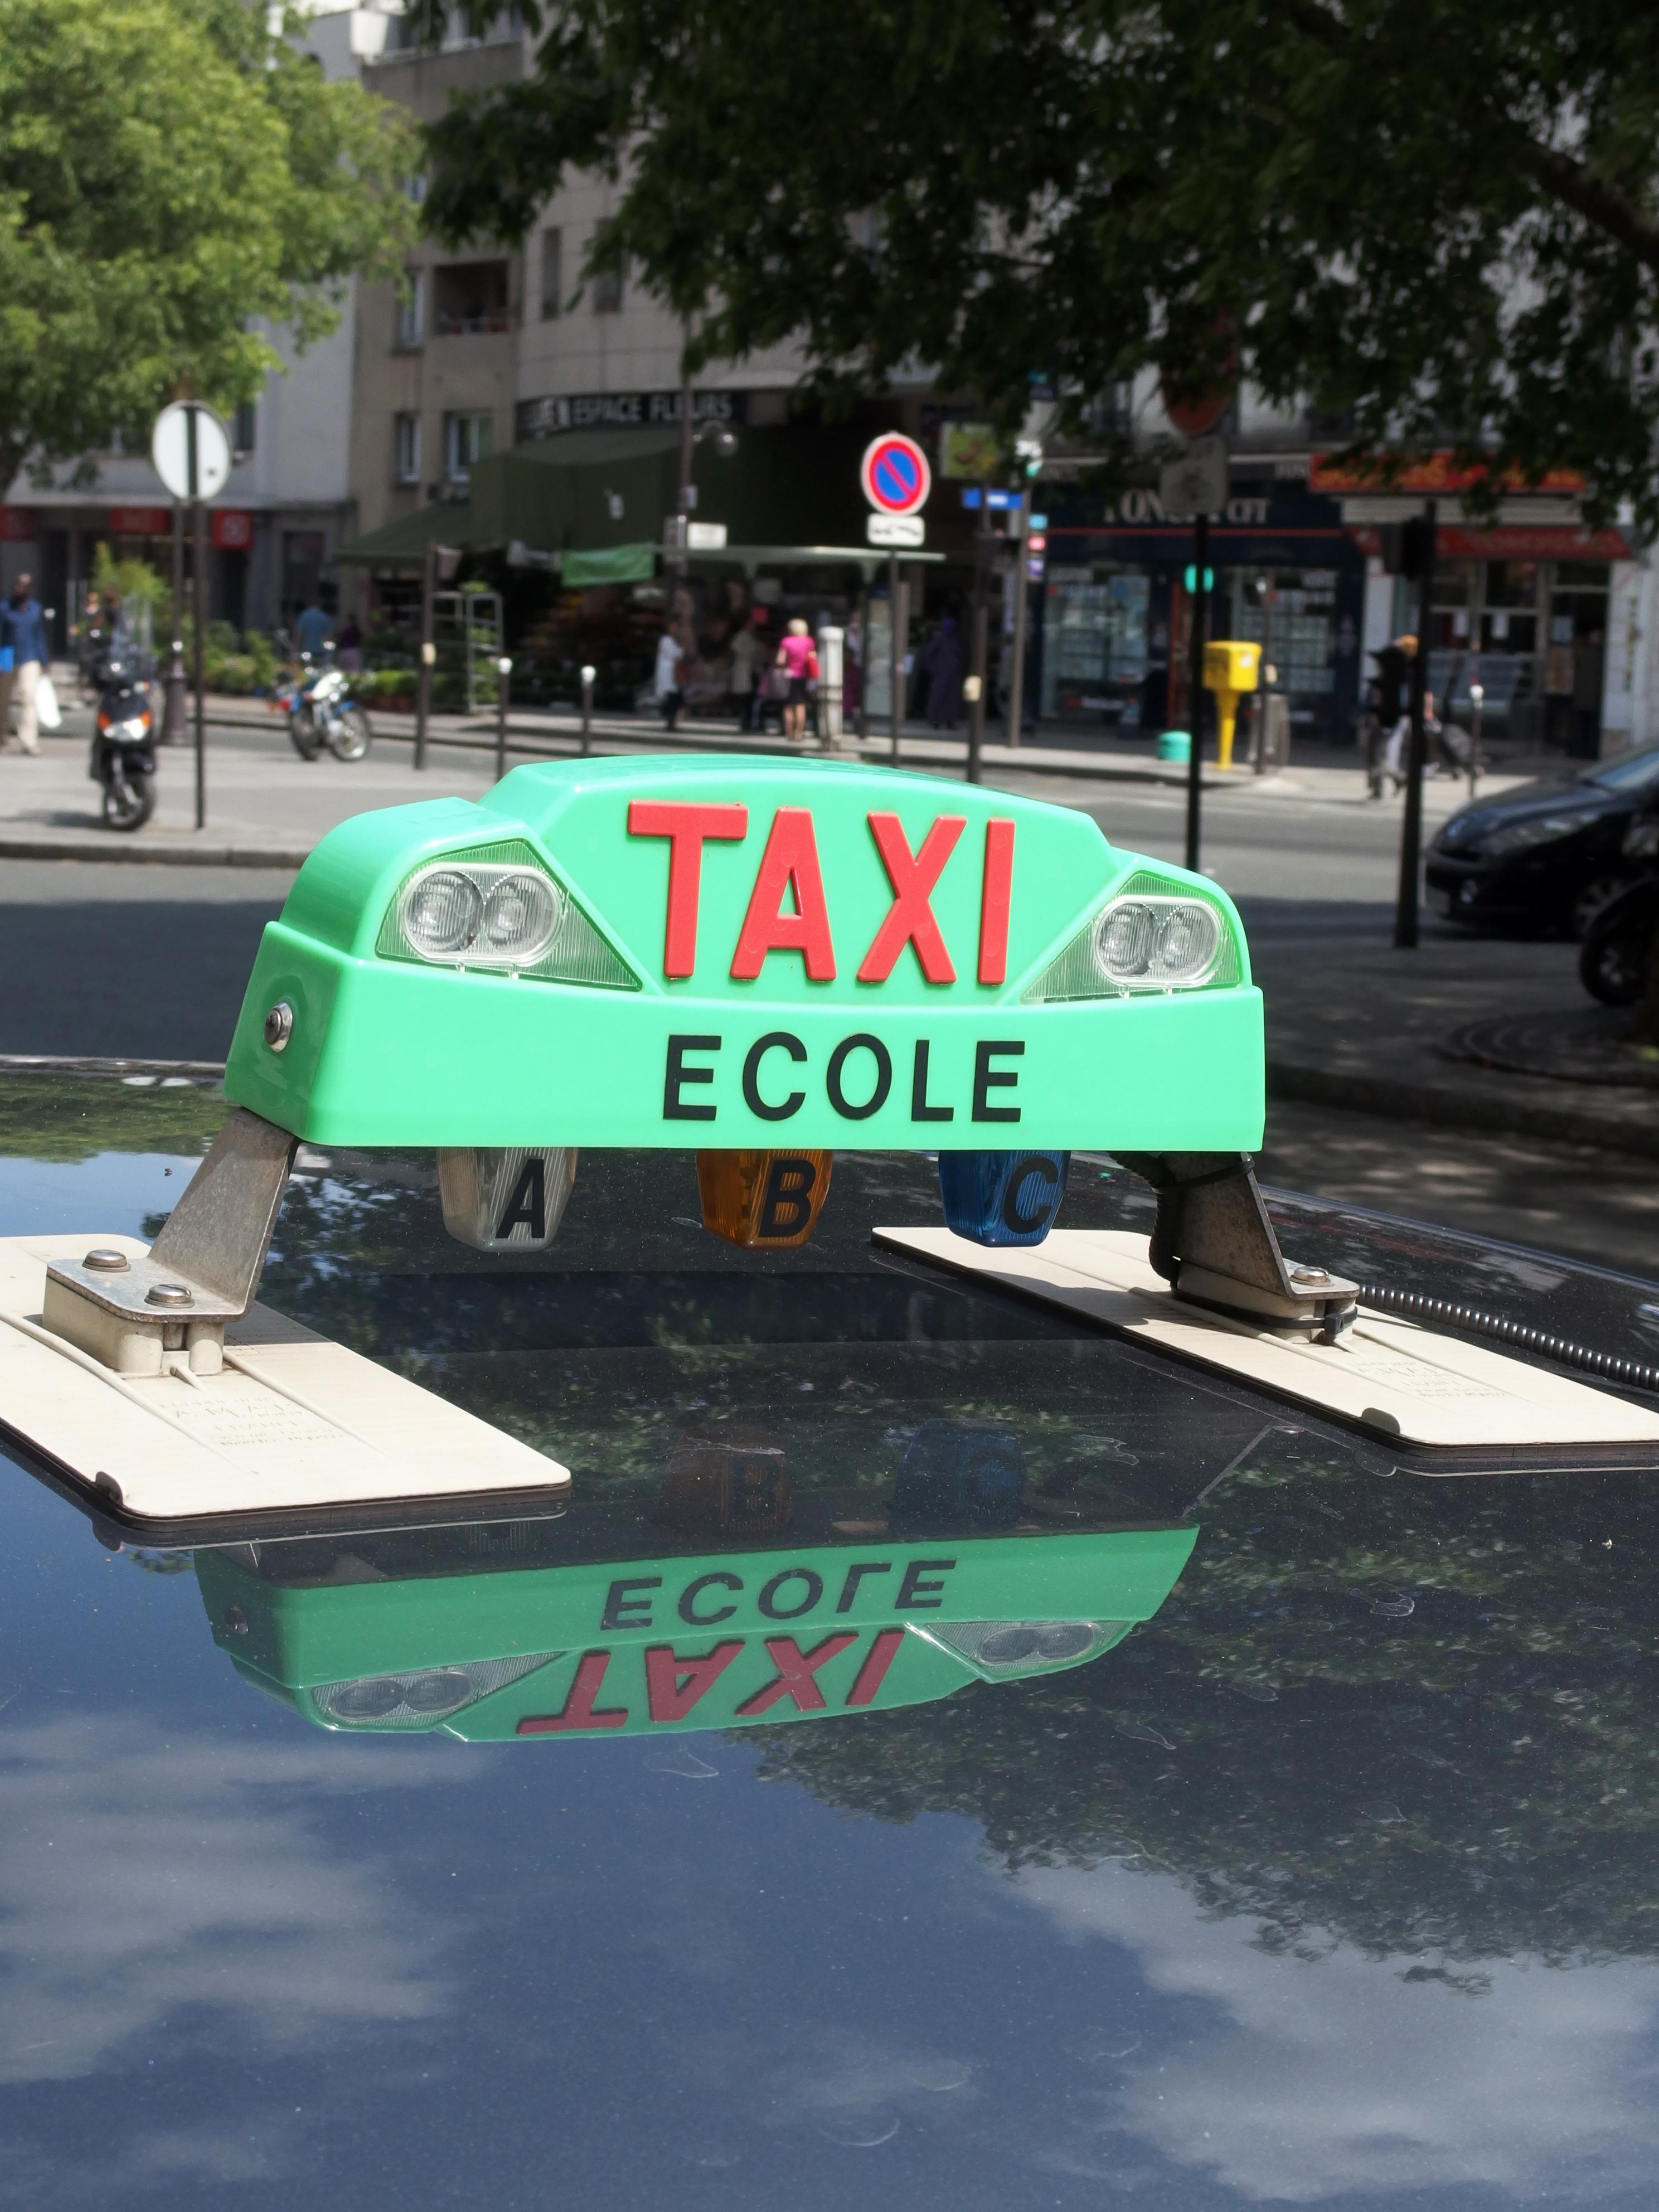 Formation taxis vtc embarquement imm diat 100 news for Resultat examen taxi 2017 chambre des metiers